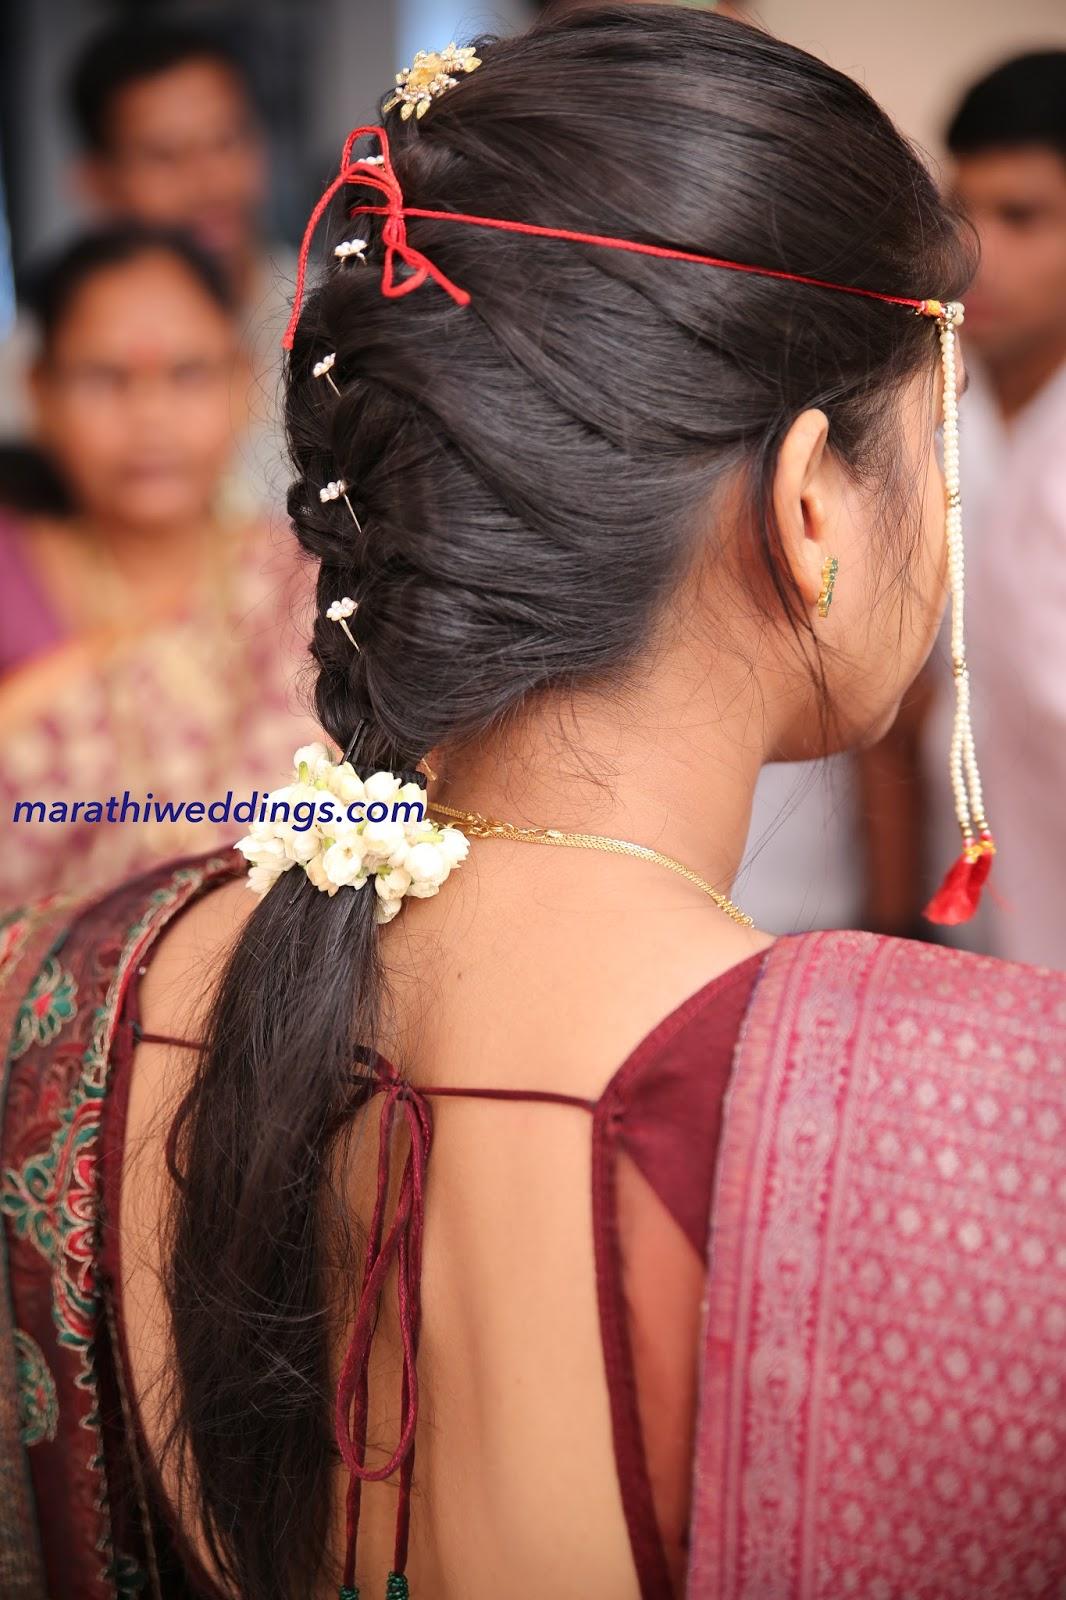 marathi weddings | indian bridal blog | my bridal diary: pre